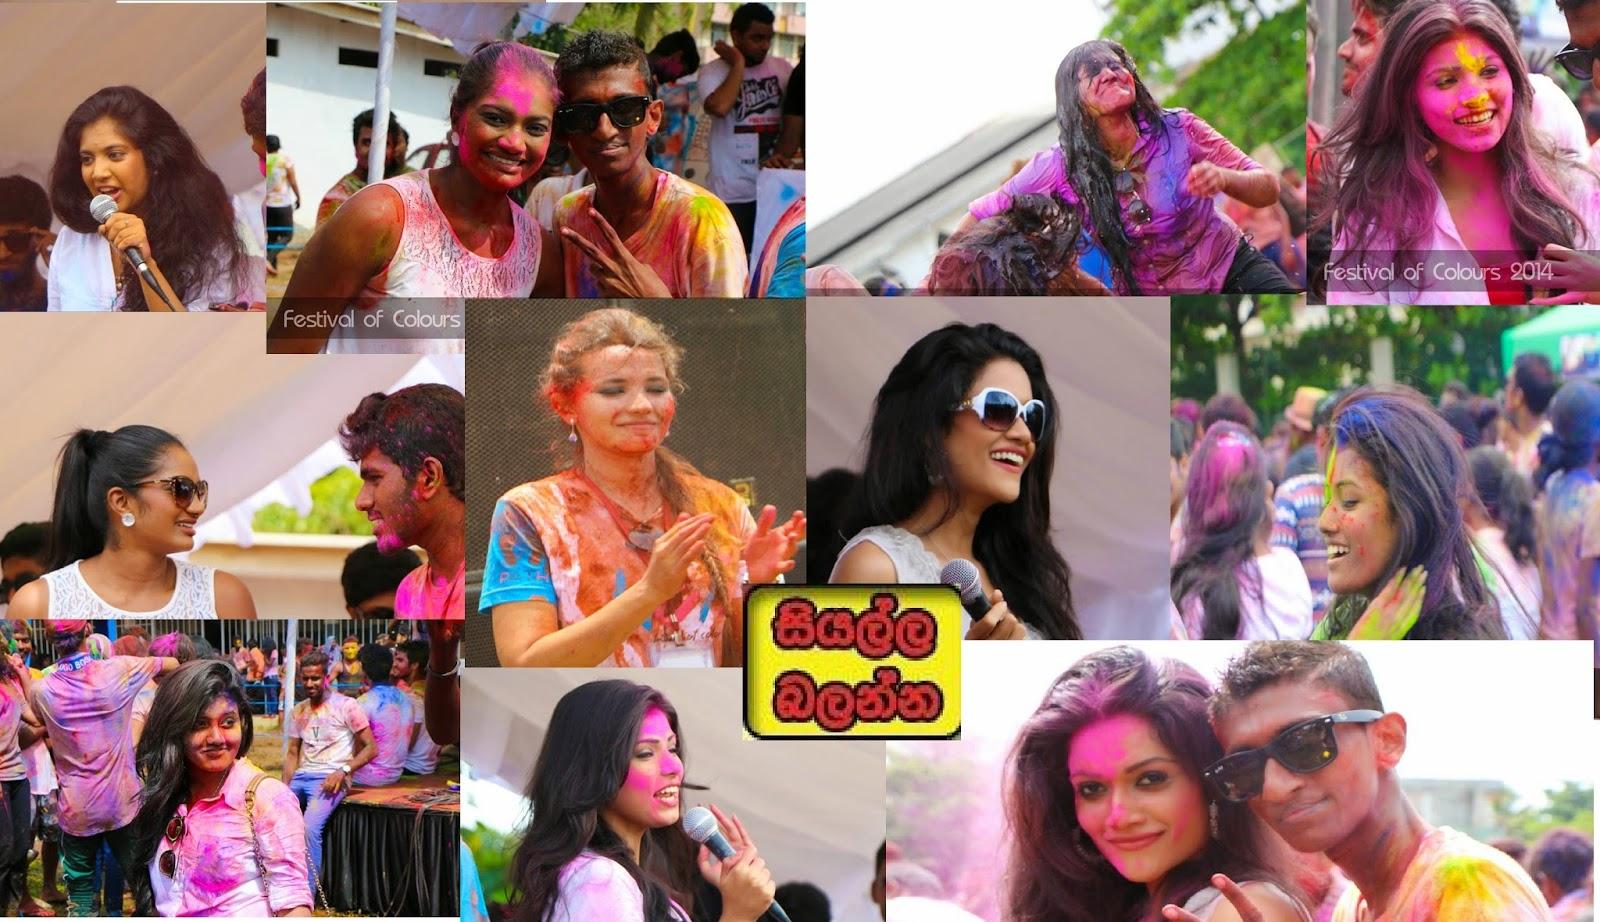 http://picture.gossiplankahotnews.com/2014/10/colour-festival-2014-holi-festival-in.html